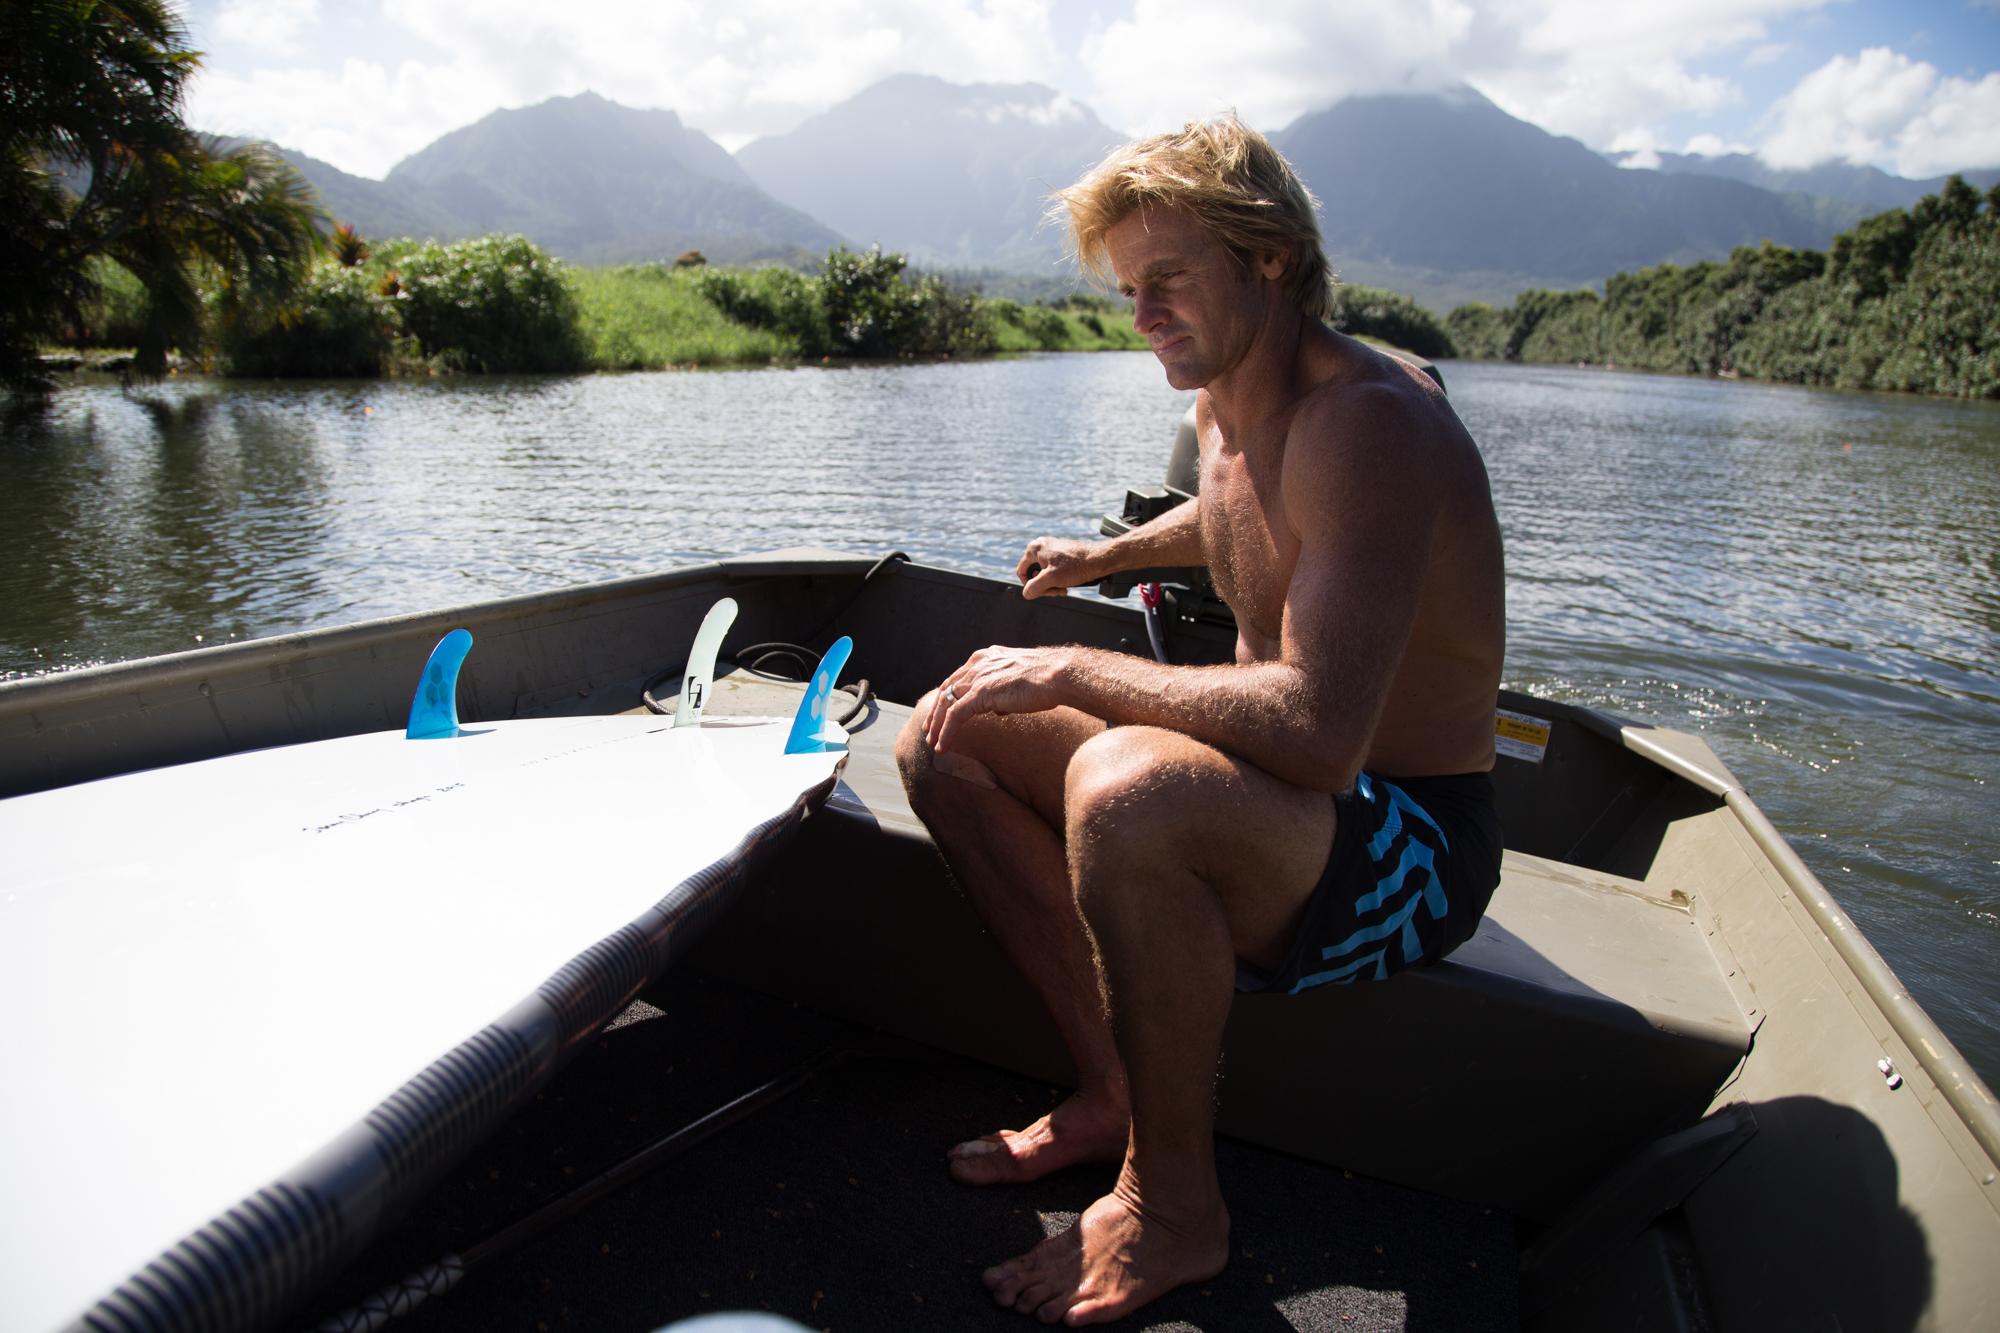 laird hamilton paddle